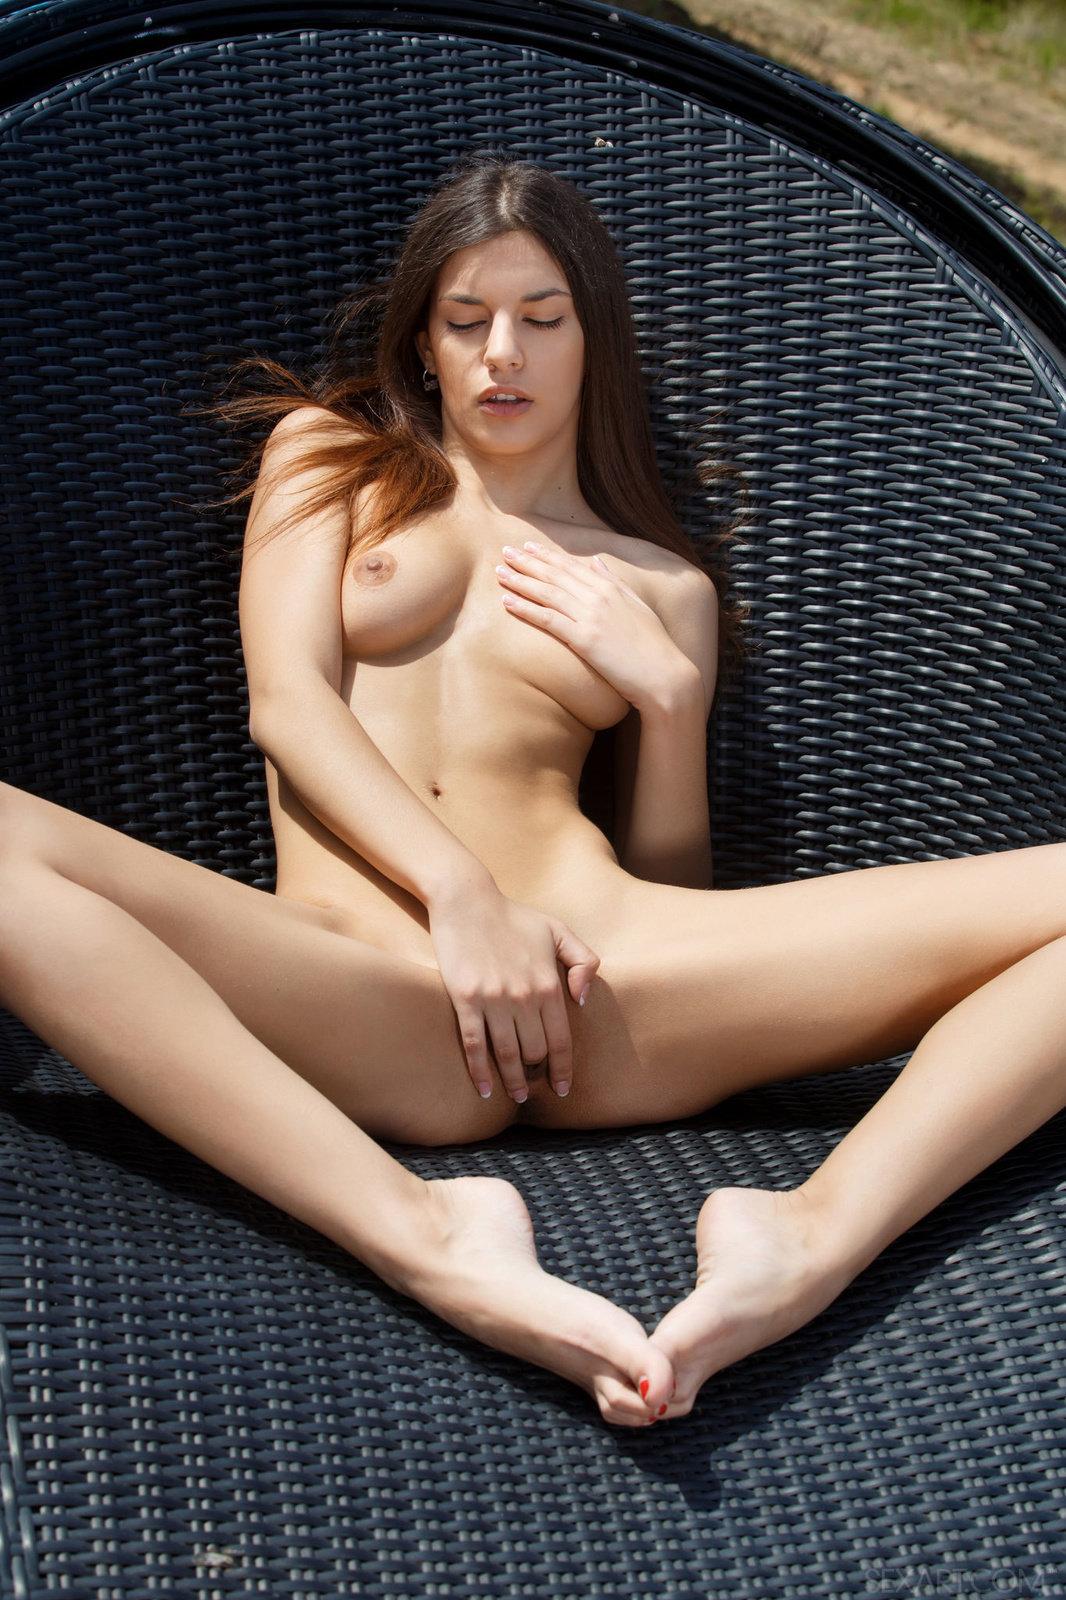 Quality porn Side boob sex